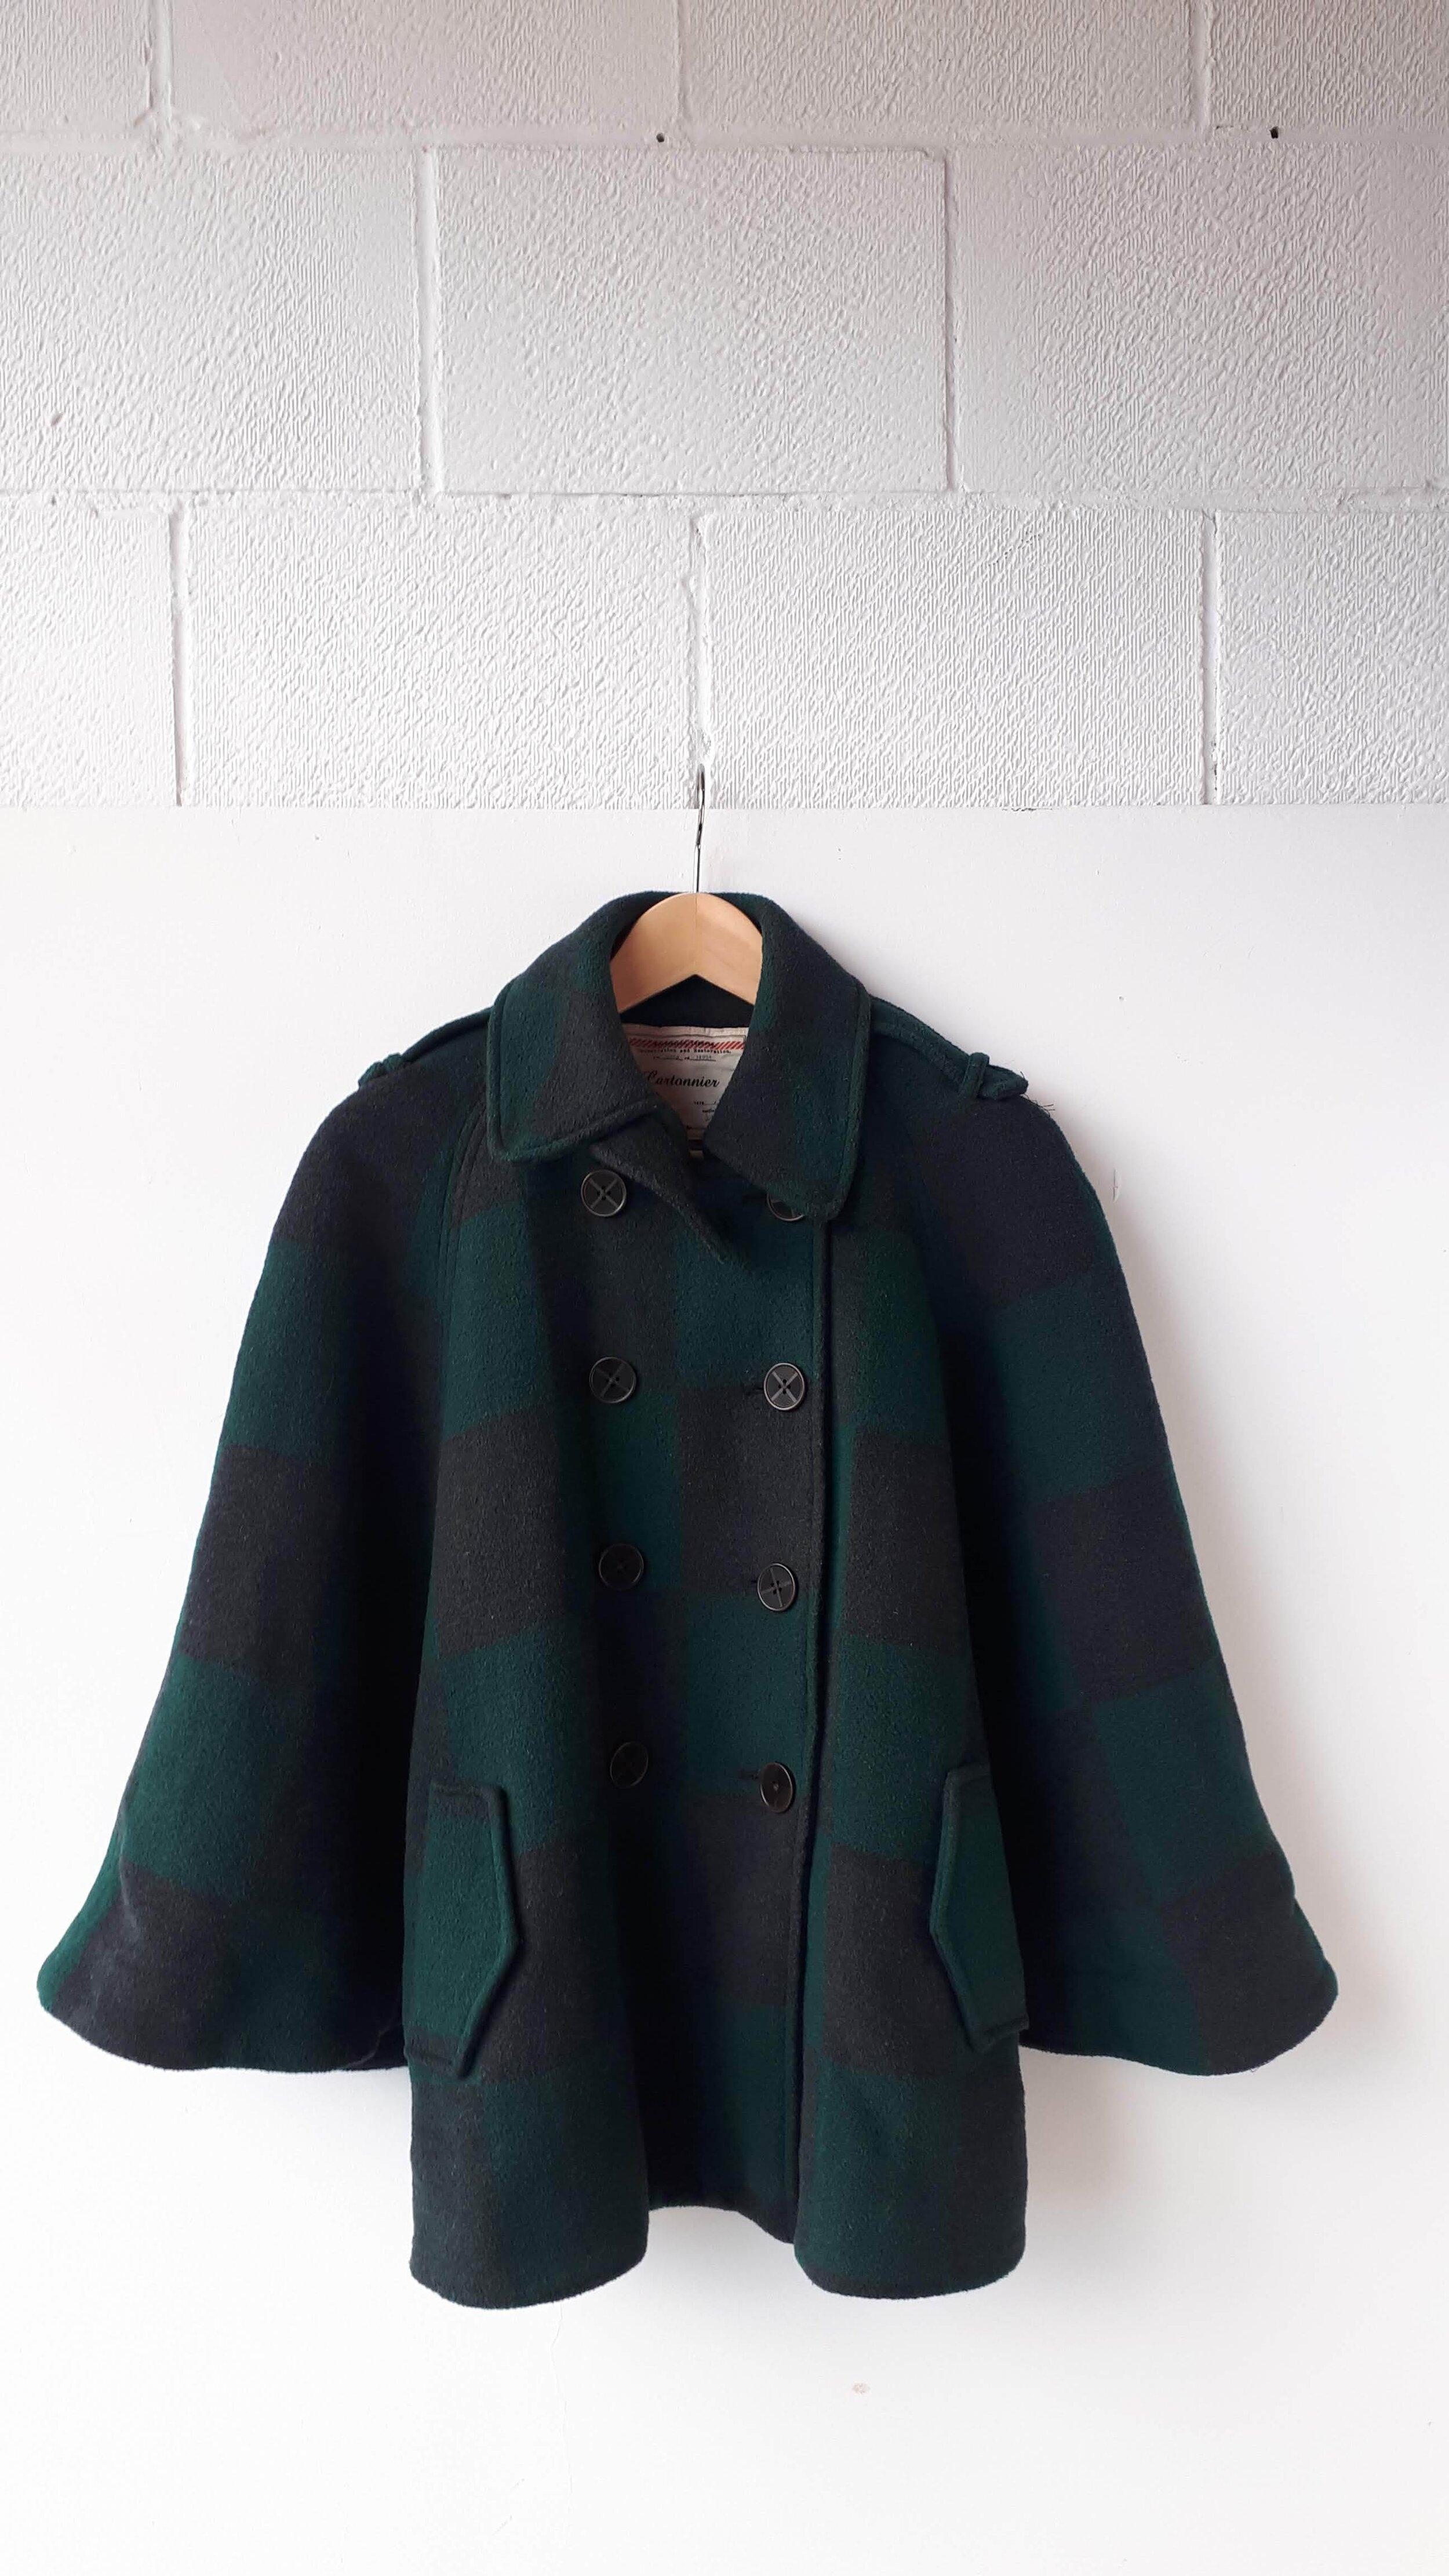 Cartonnier cape; Size L, $46